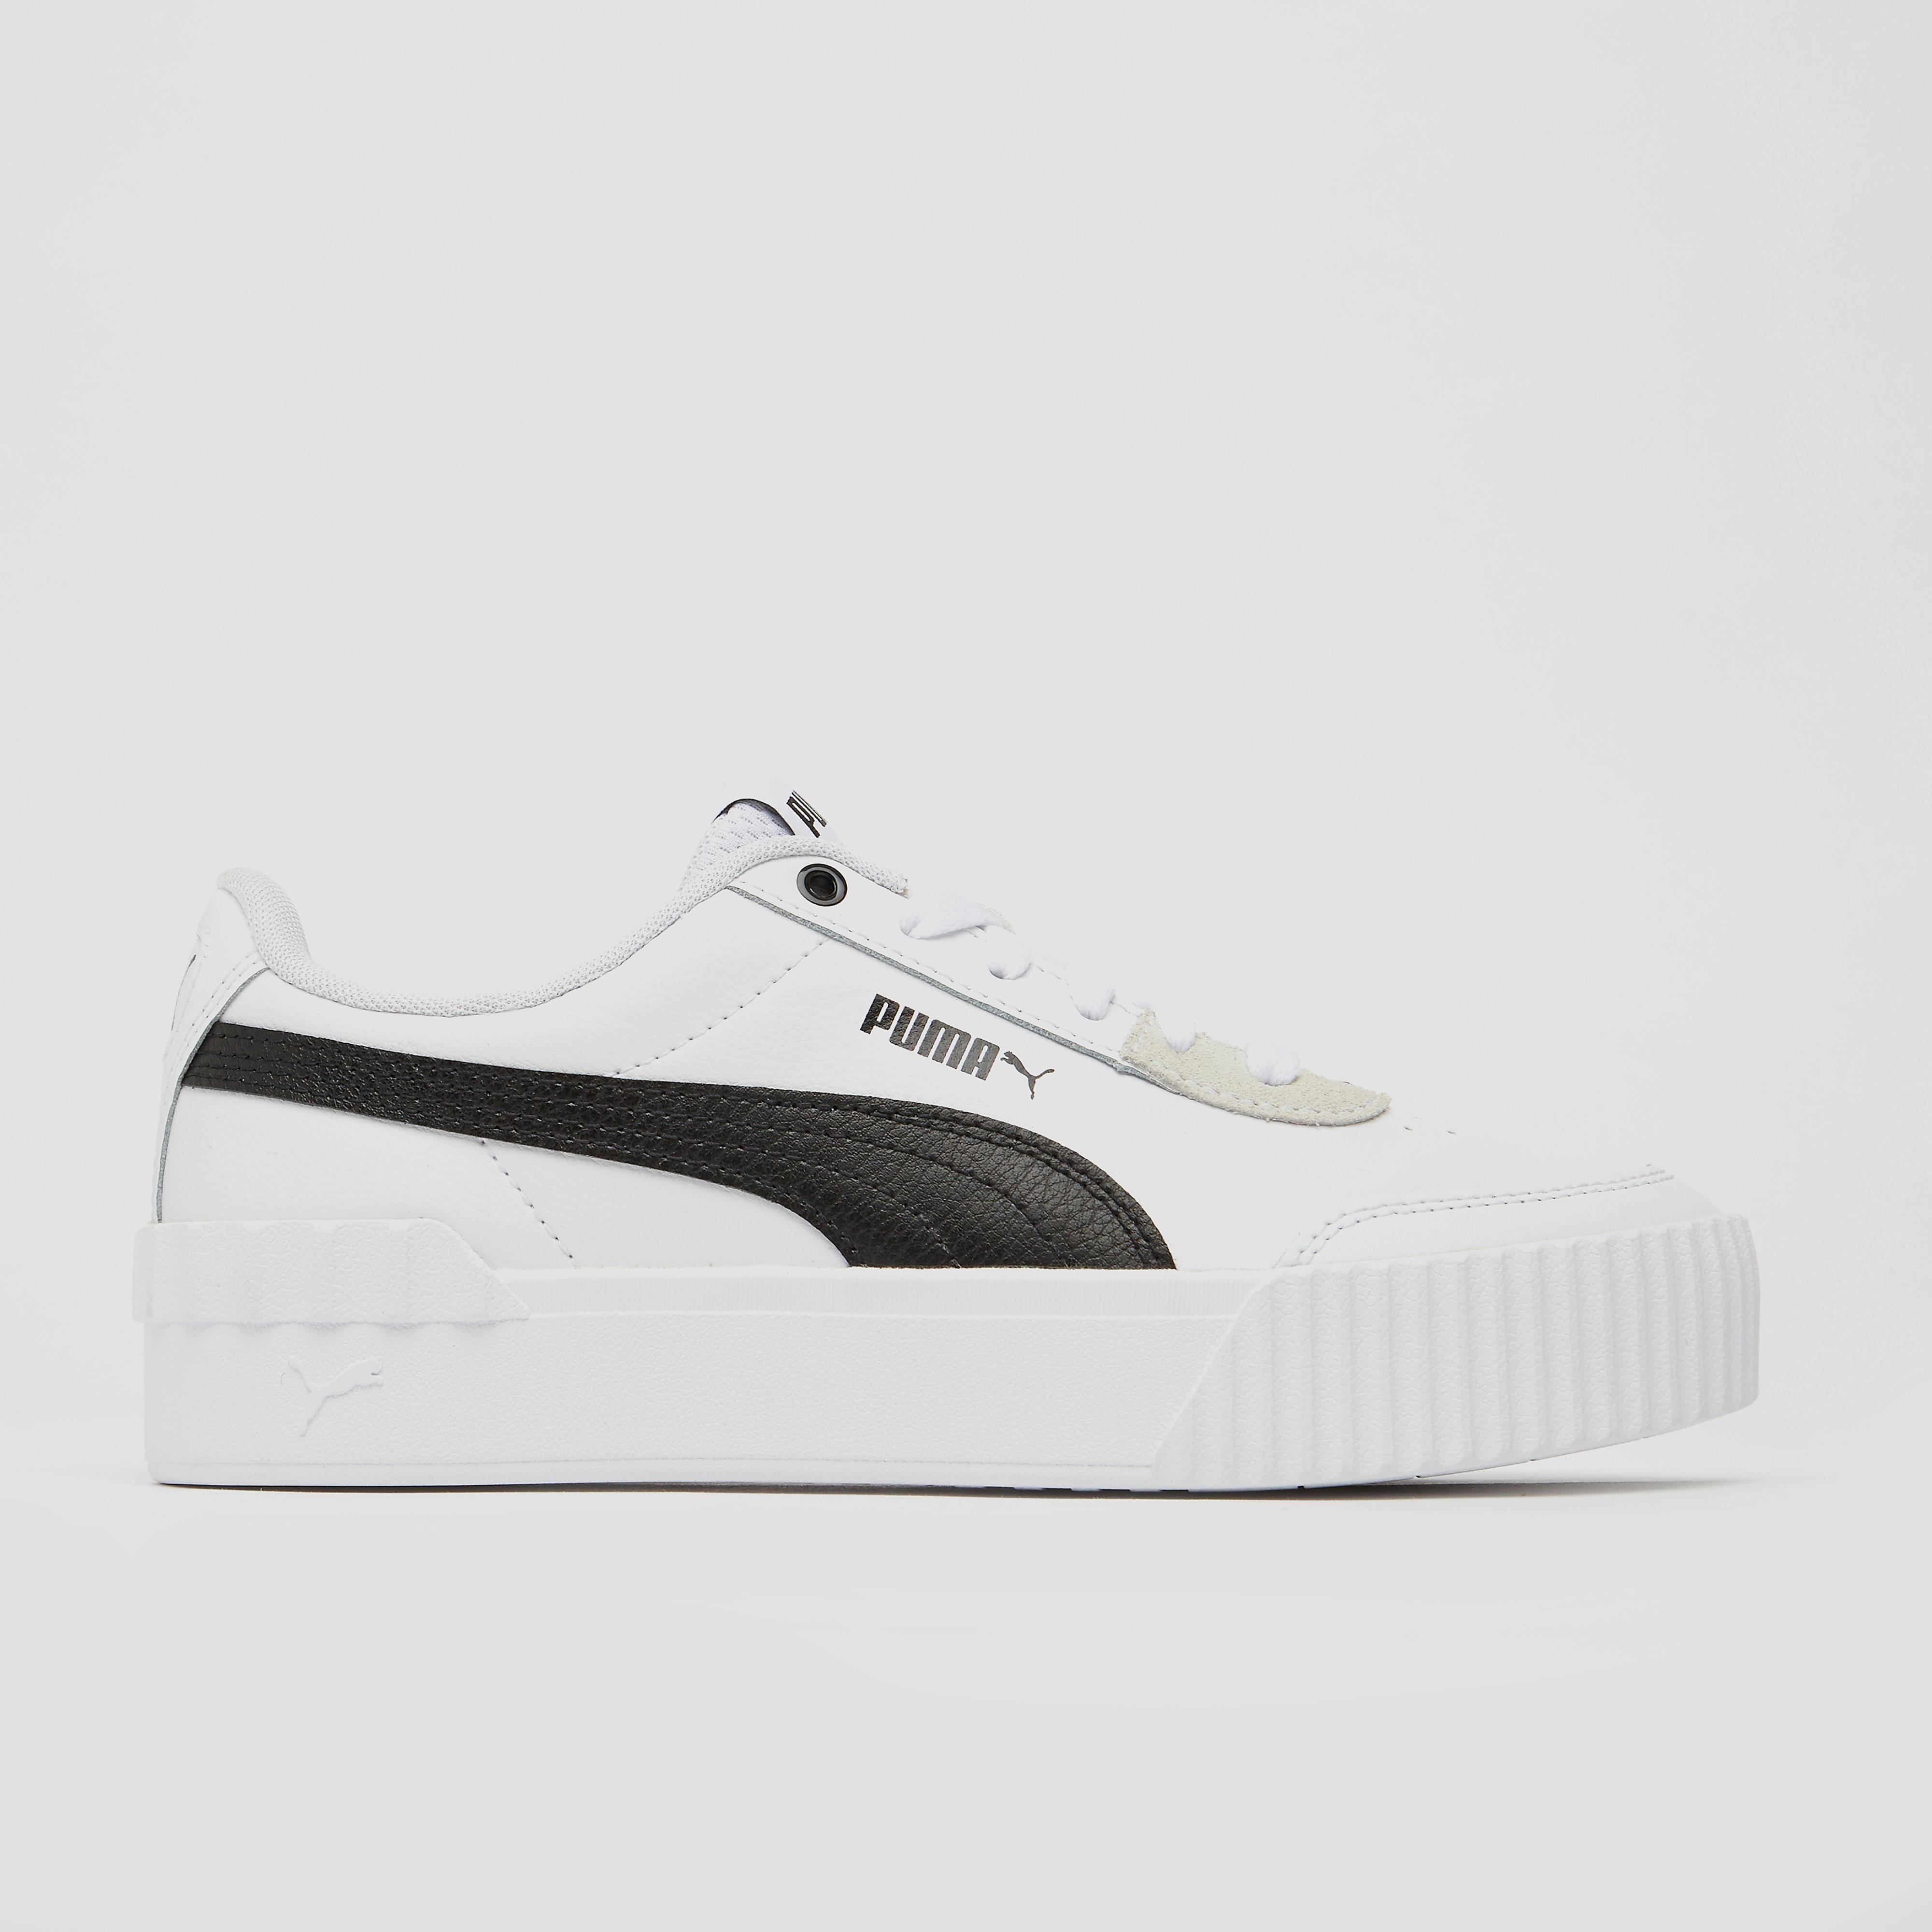 Puma carina lift sneakers wit/zwart dames online kopen